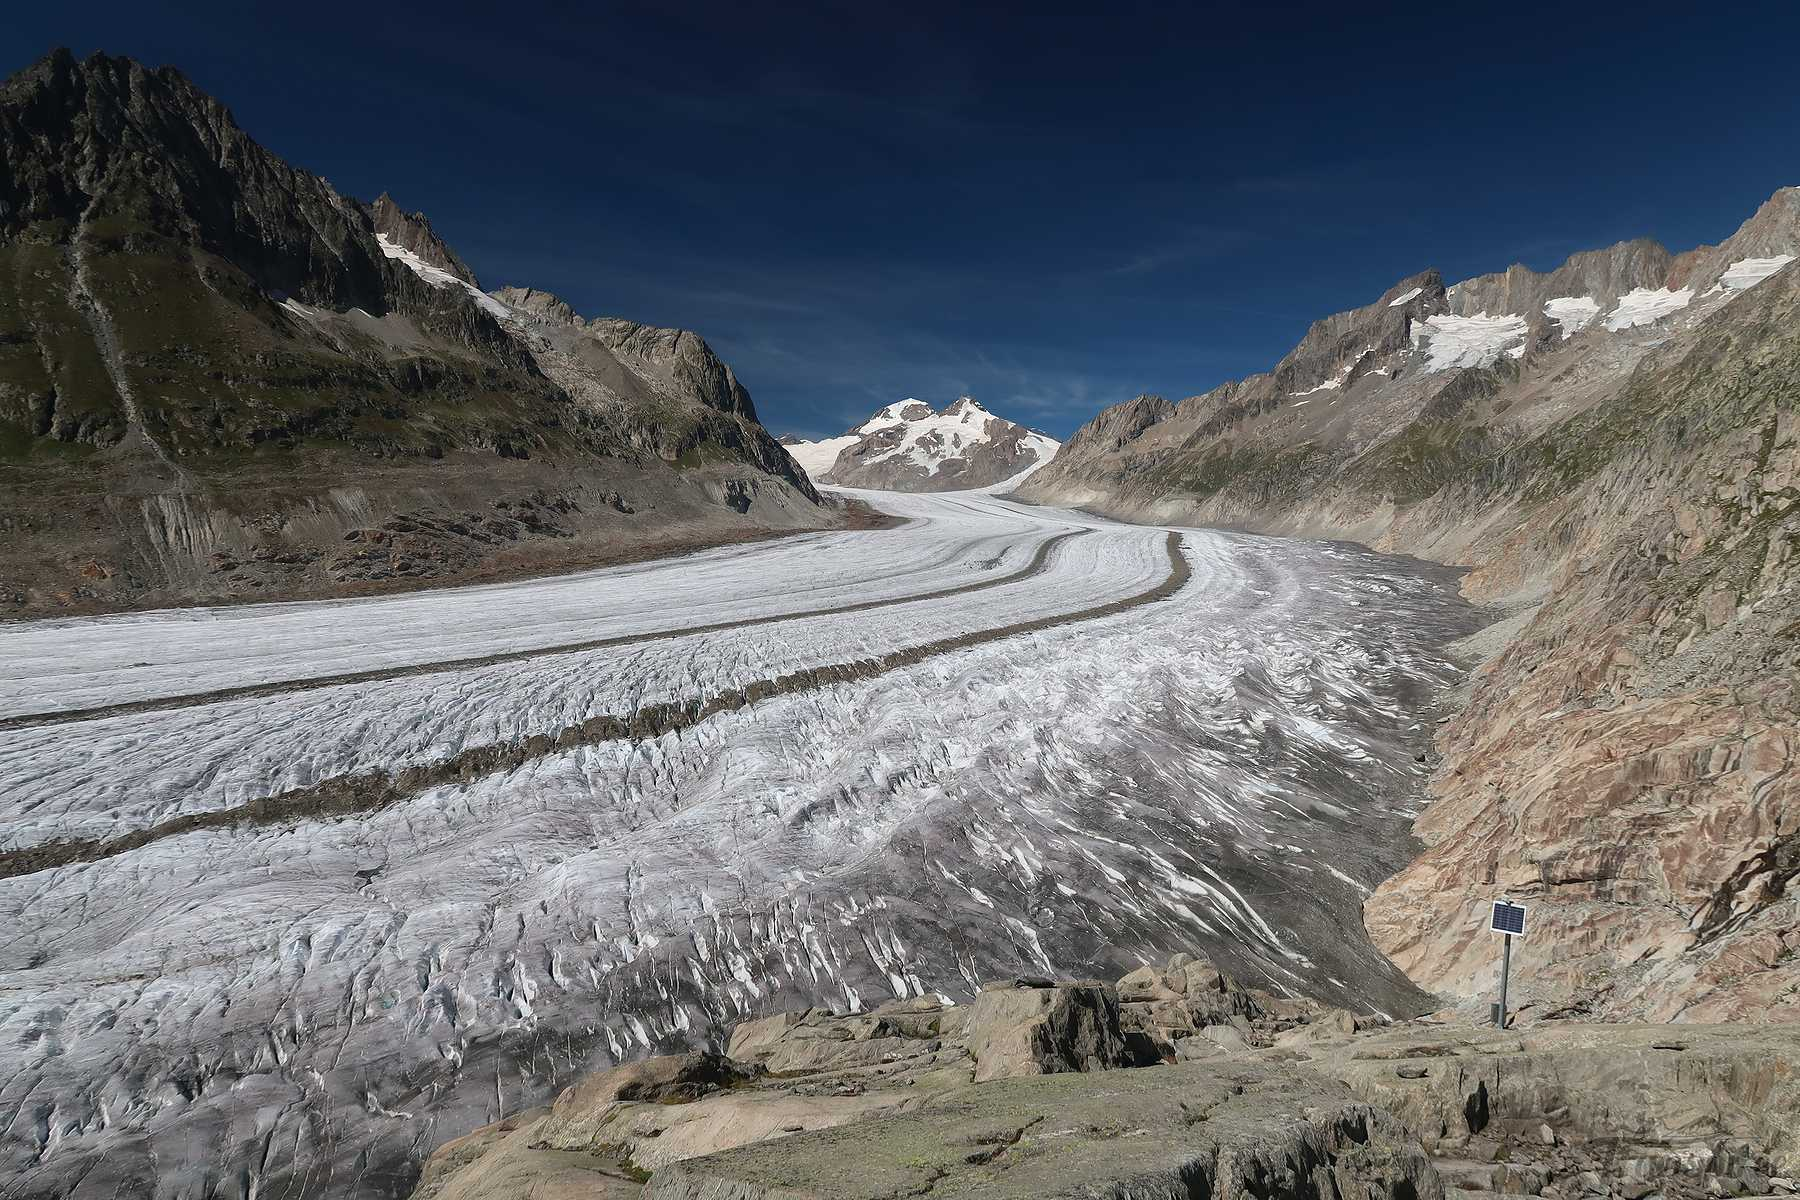 Randonnée au glacier d'Aletsch depuis Fiesch et le Märjenlenseen